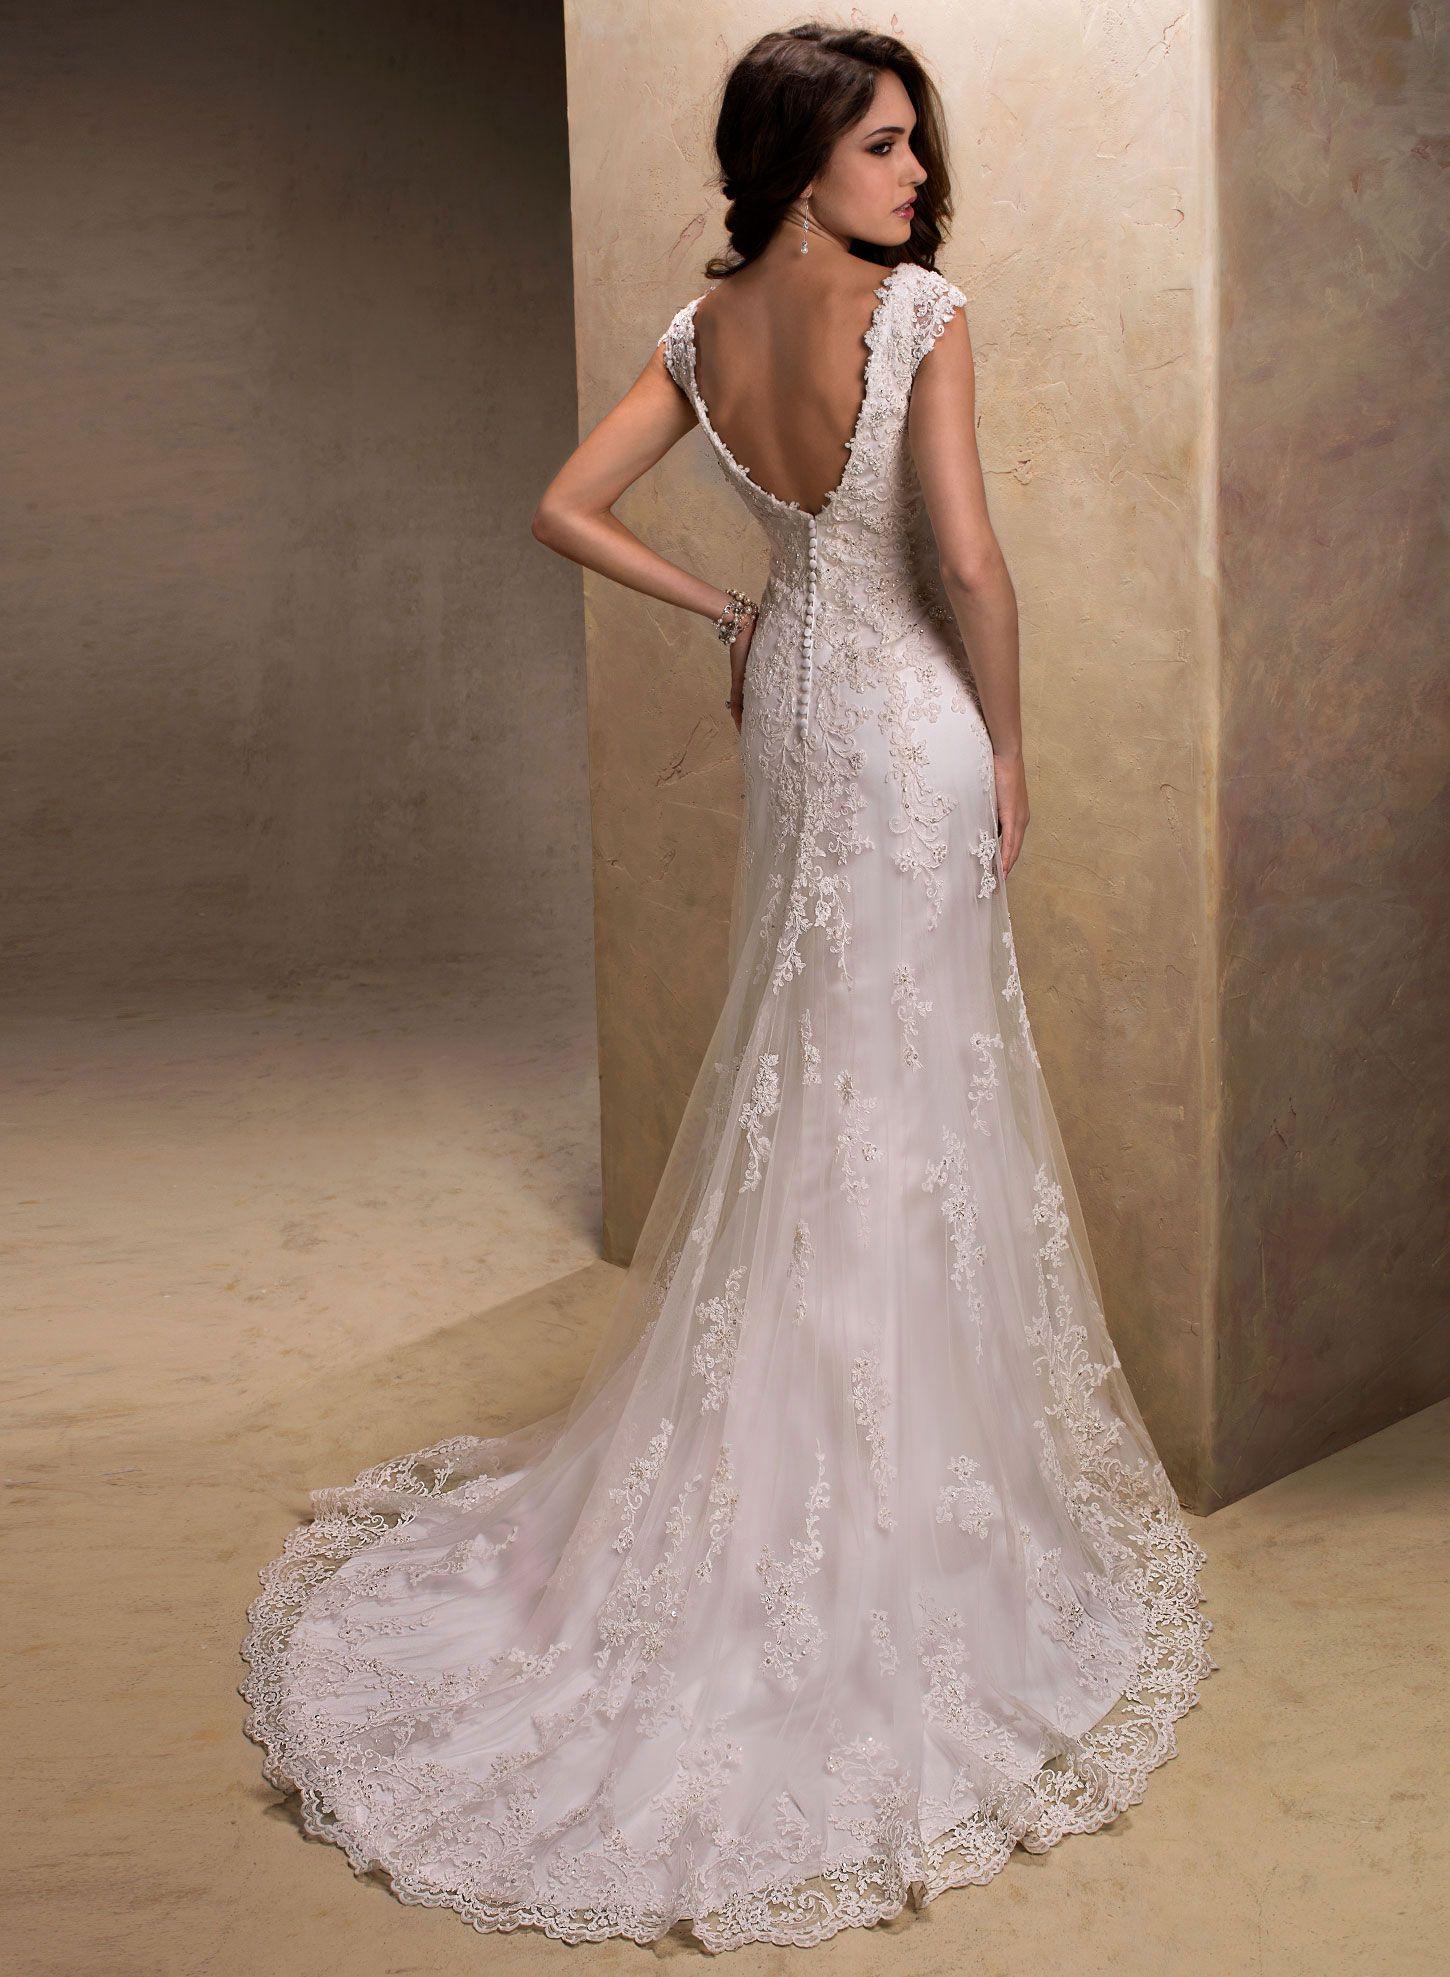 Extremamente Escolhendo entre modelos de vestidos de noiva - Casamento Noiva  CU13